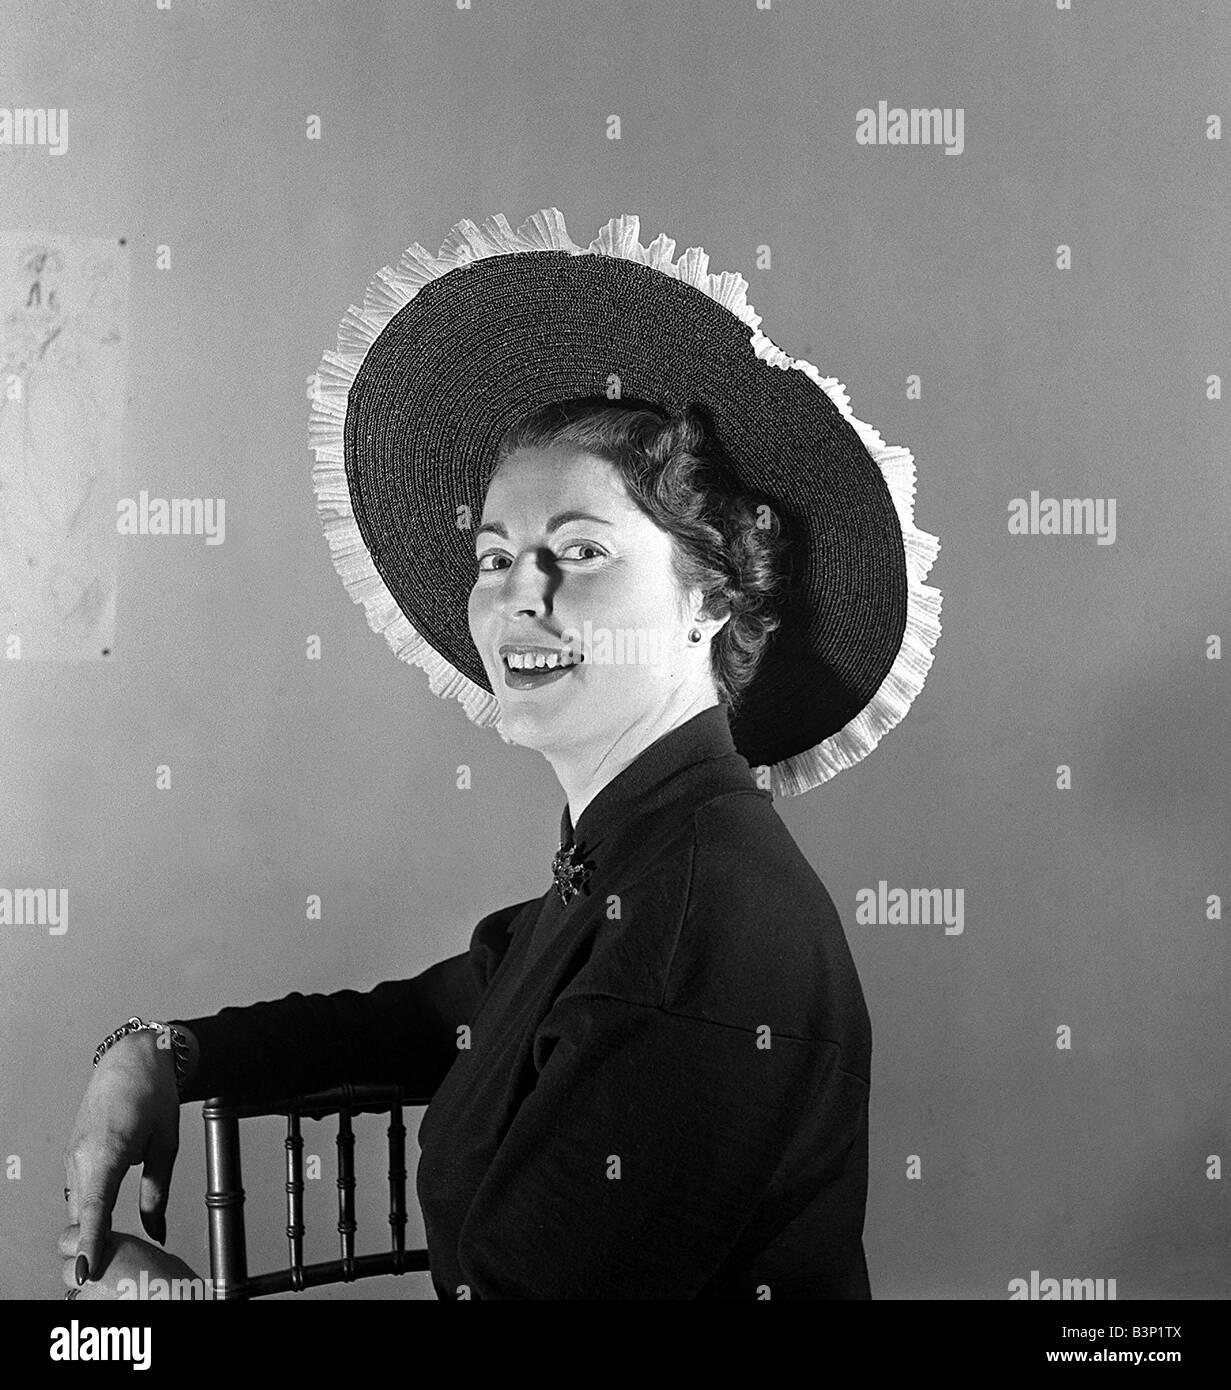 Daily Mirror Fashion editor Ailsa Garland wearing coronation hat by JeffStock Photo